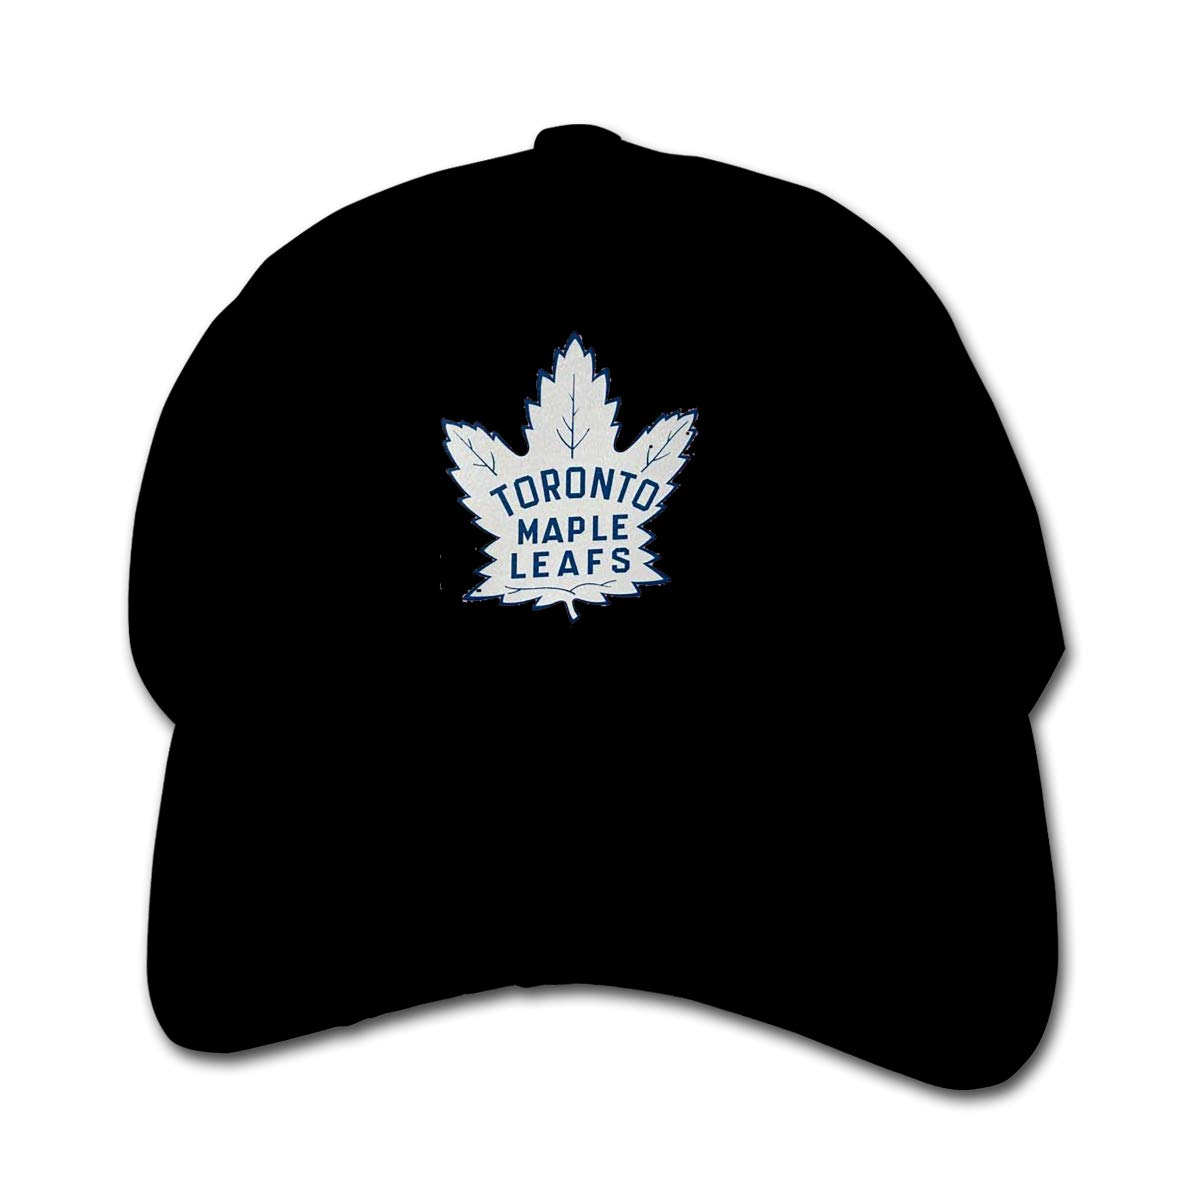 Angkella Hockey-Logo-Toronto-Maple-Leafs Children Toddler Infant Cap Hat Peaked Baseball Hats Black